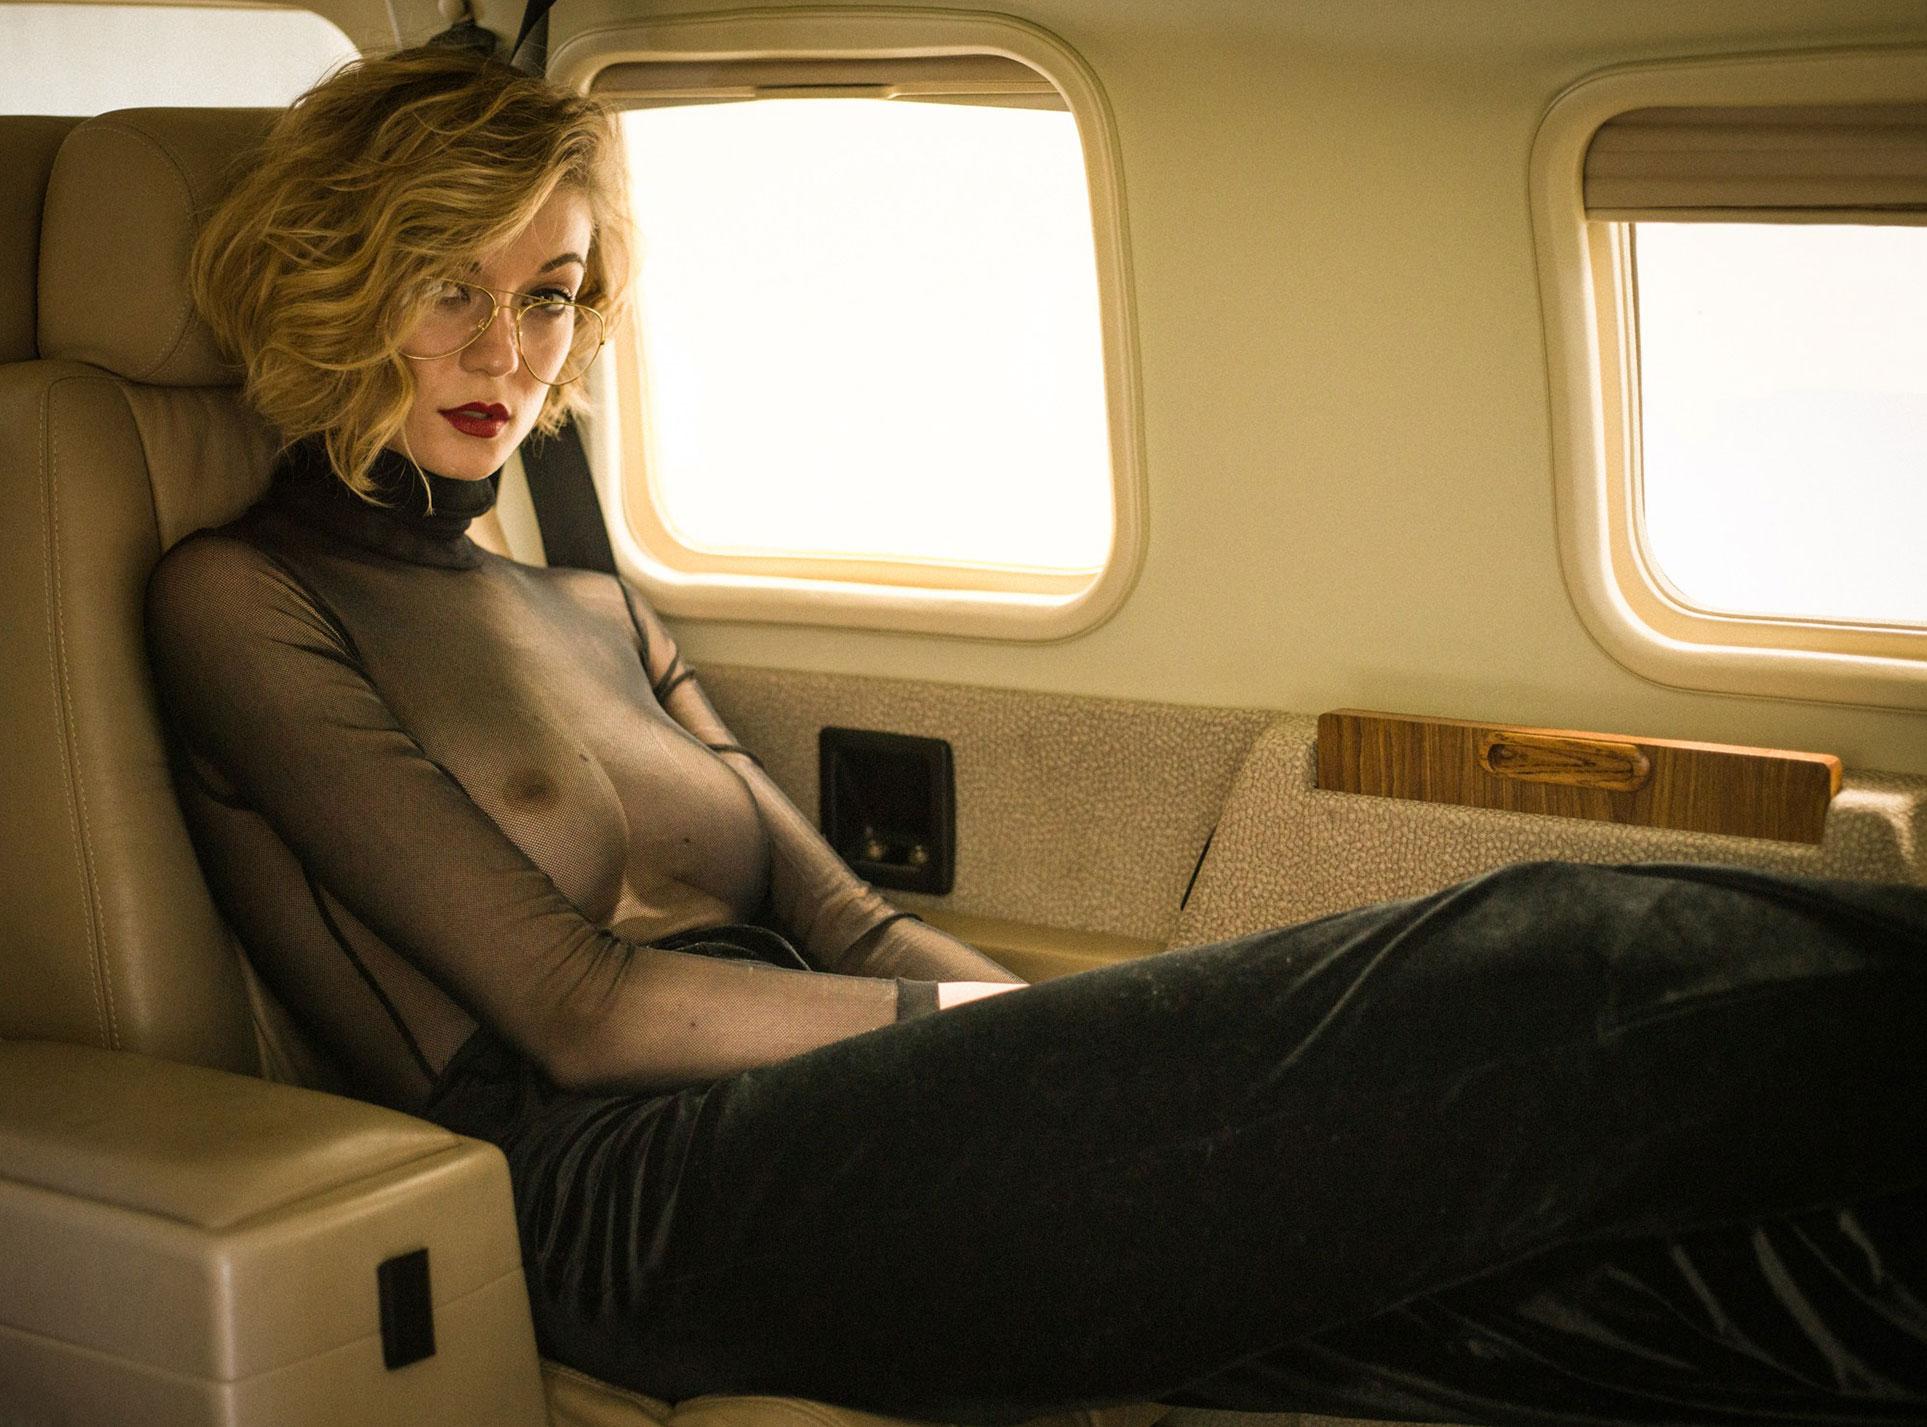 сексуальная угонщица самолета Анна-Лиза / фото 07